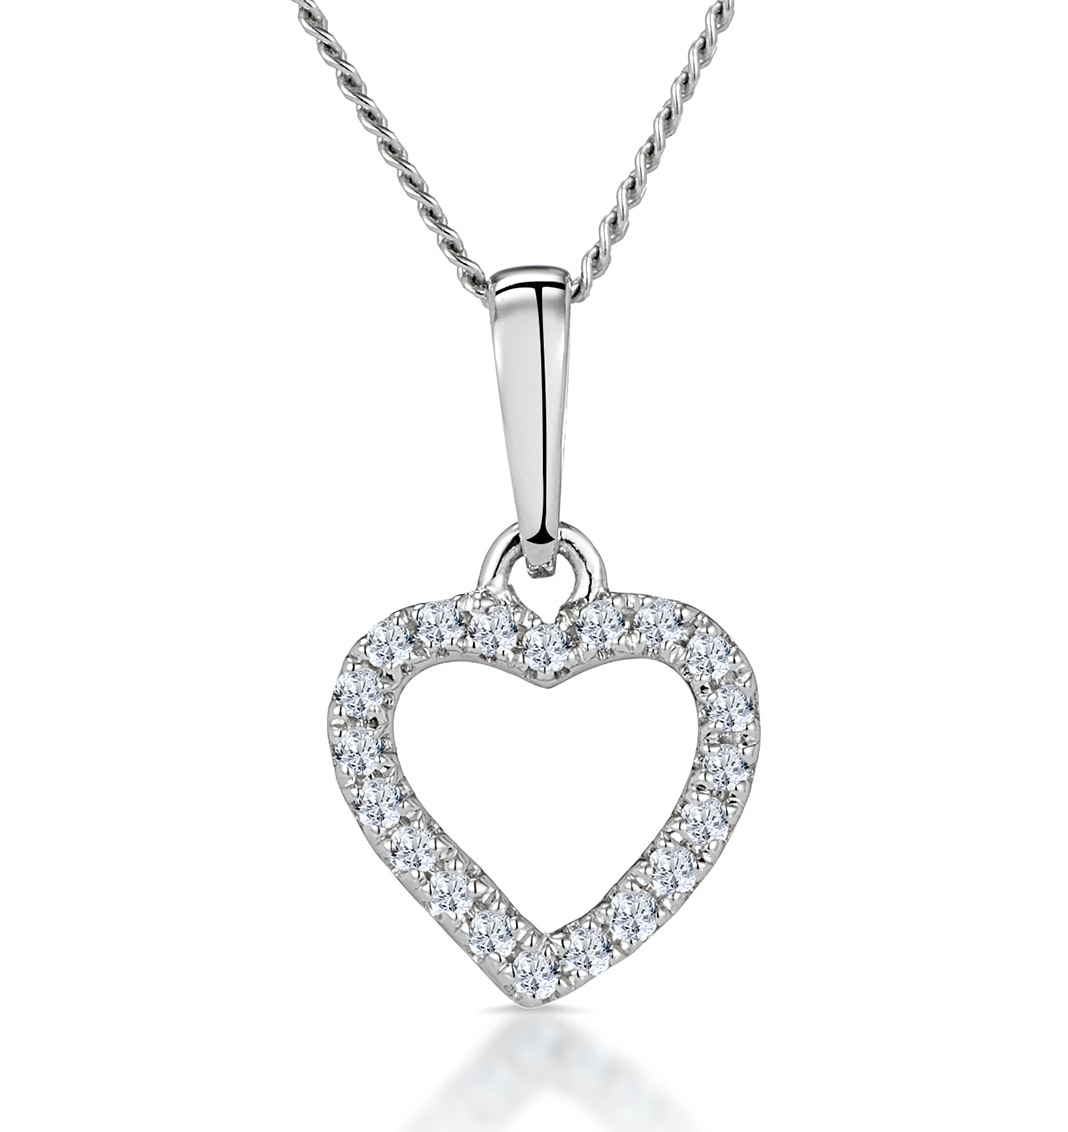 Stellato Diamond Heart Necklace in 9K White Gold